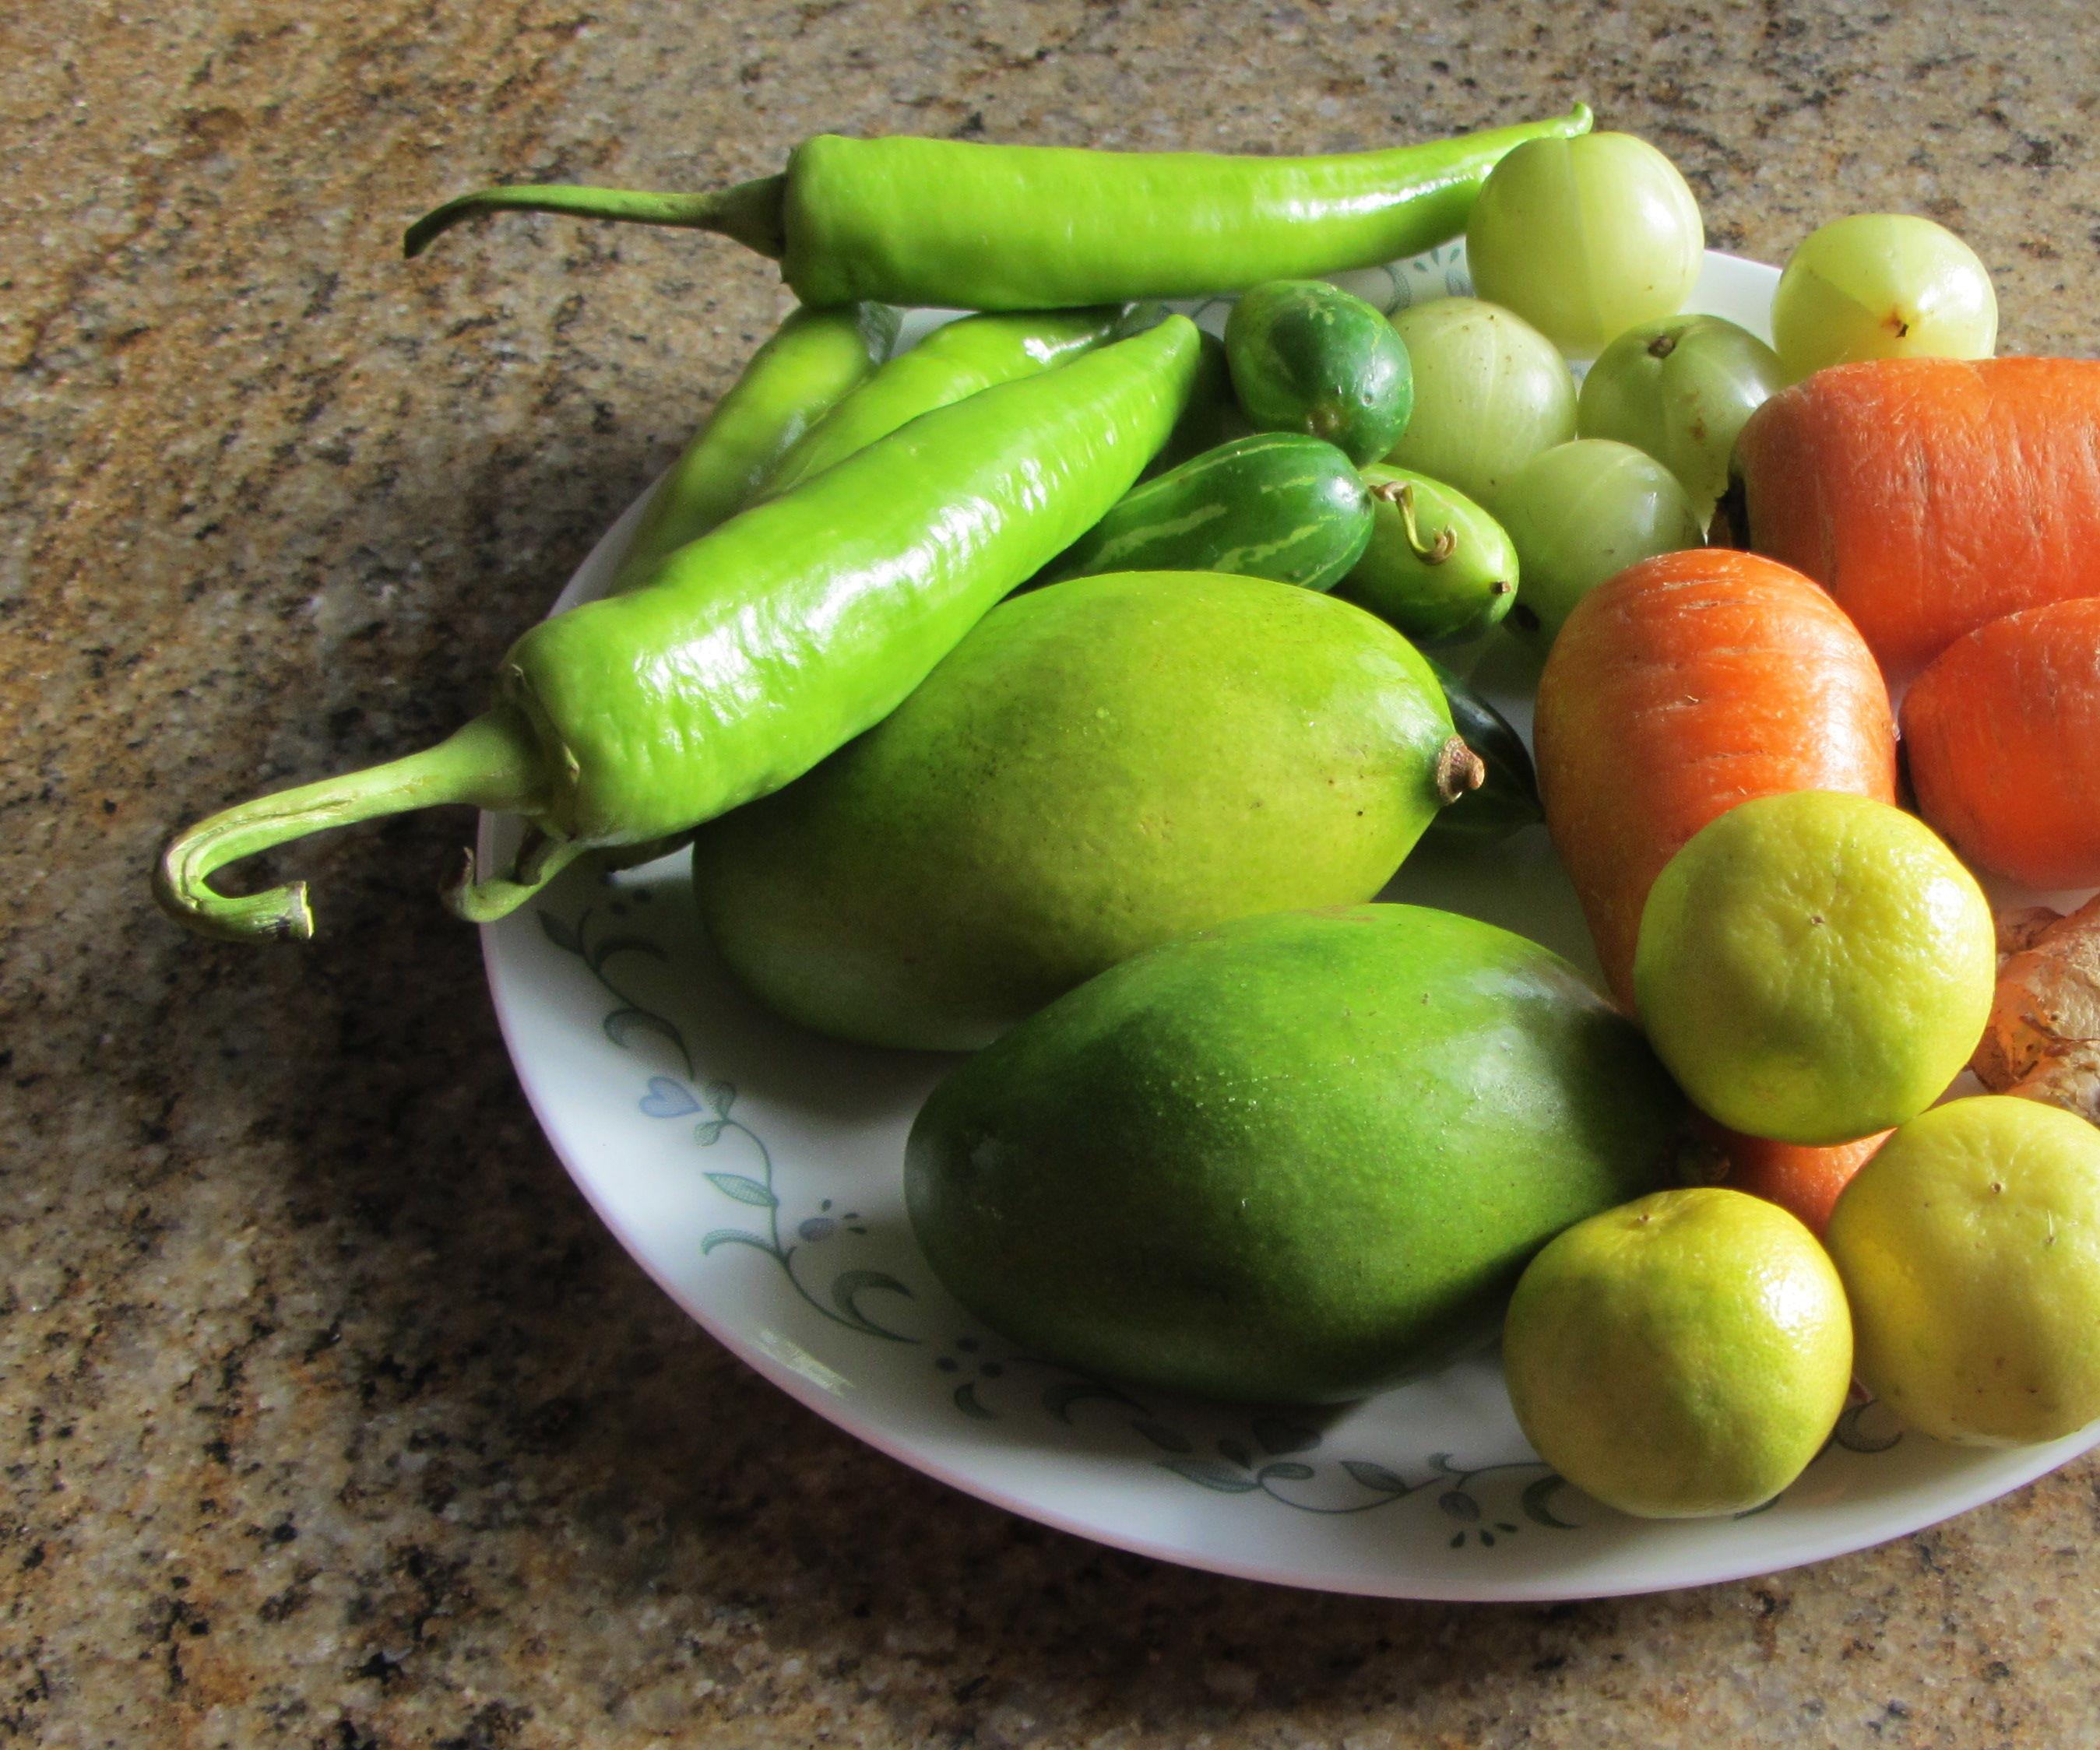 Easy Peasy Pickled Veggies [10 min max!]